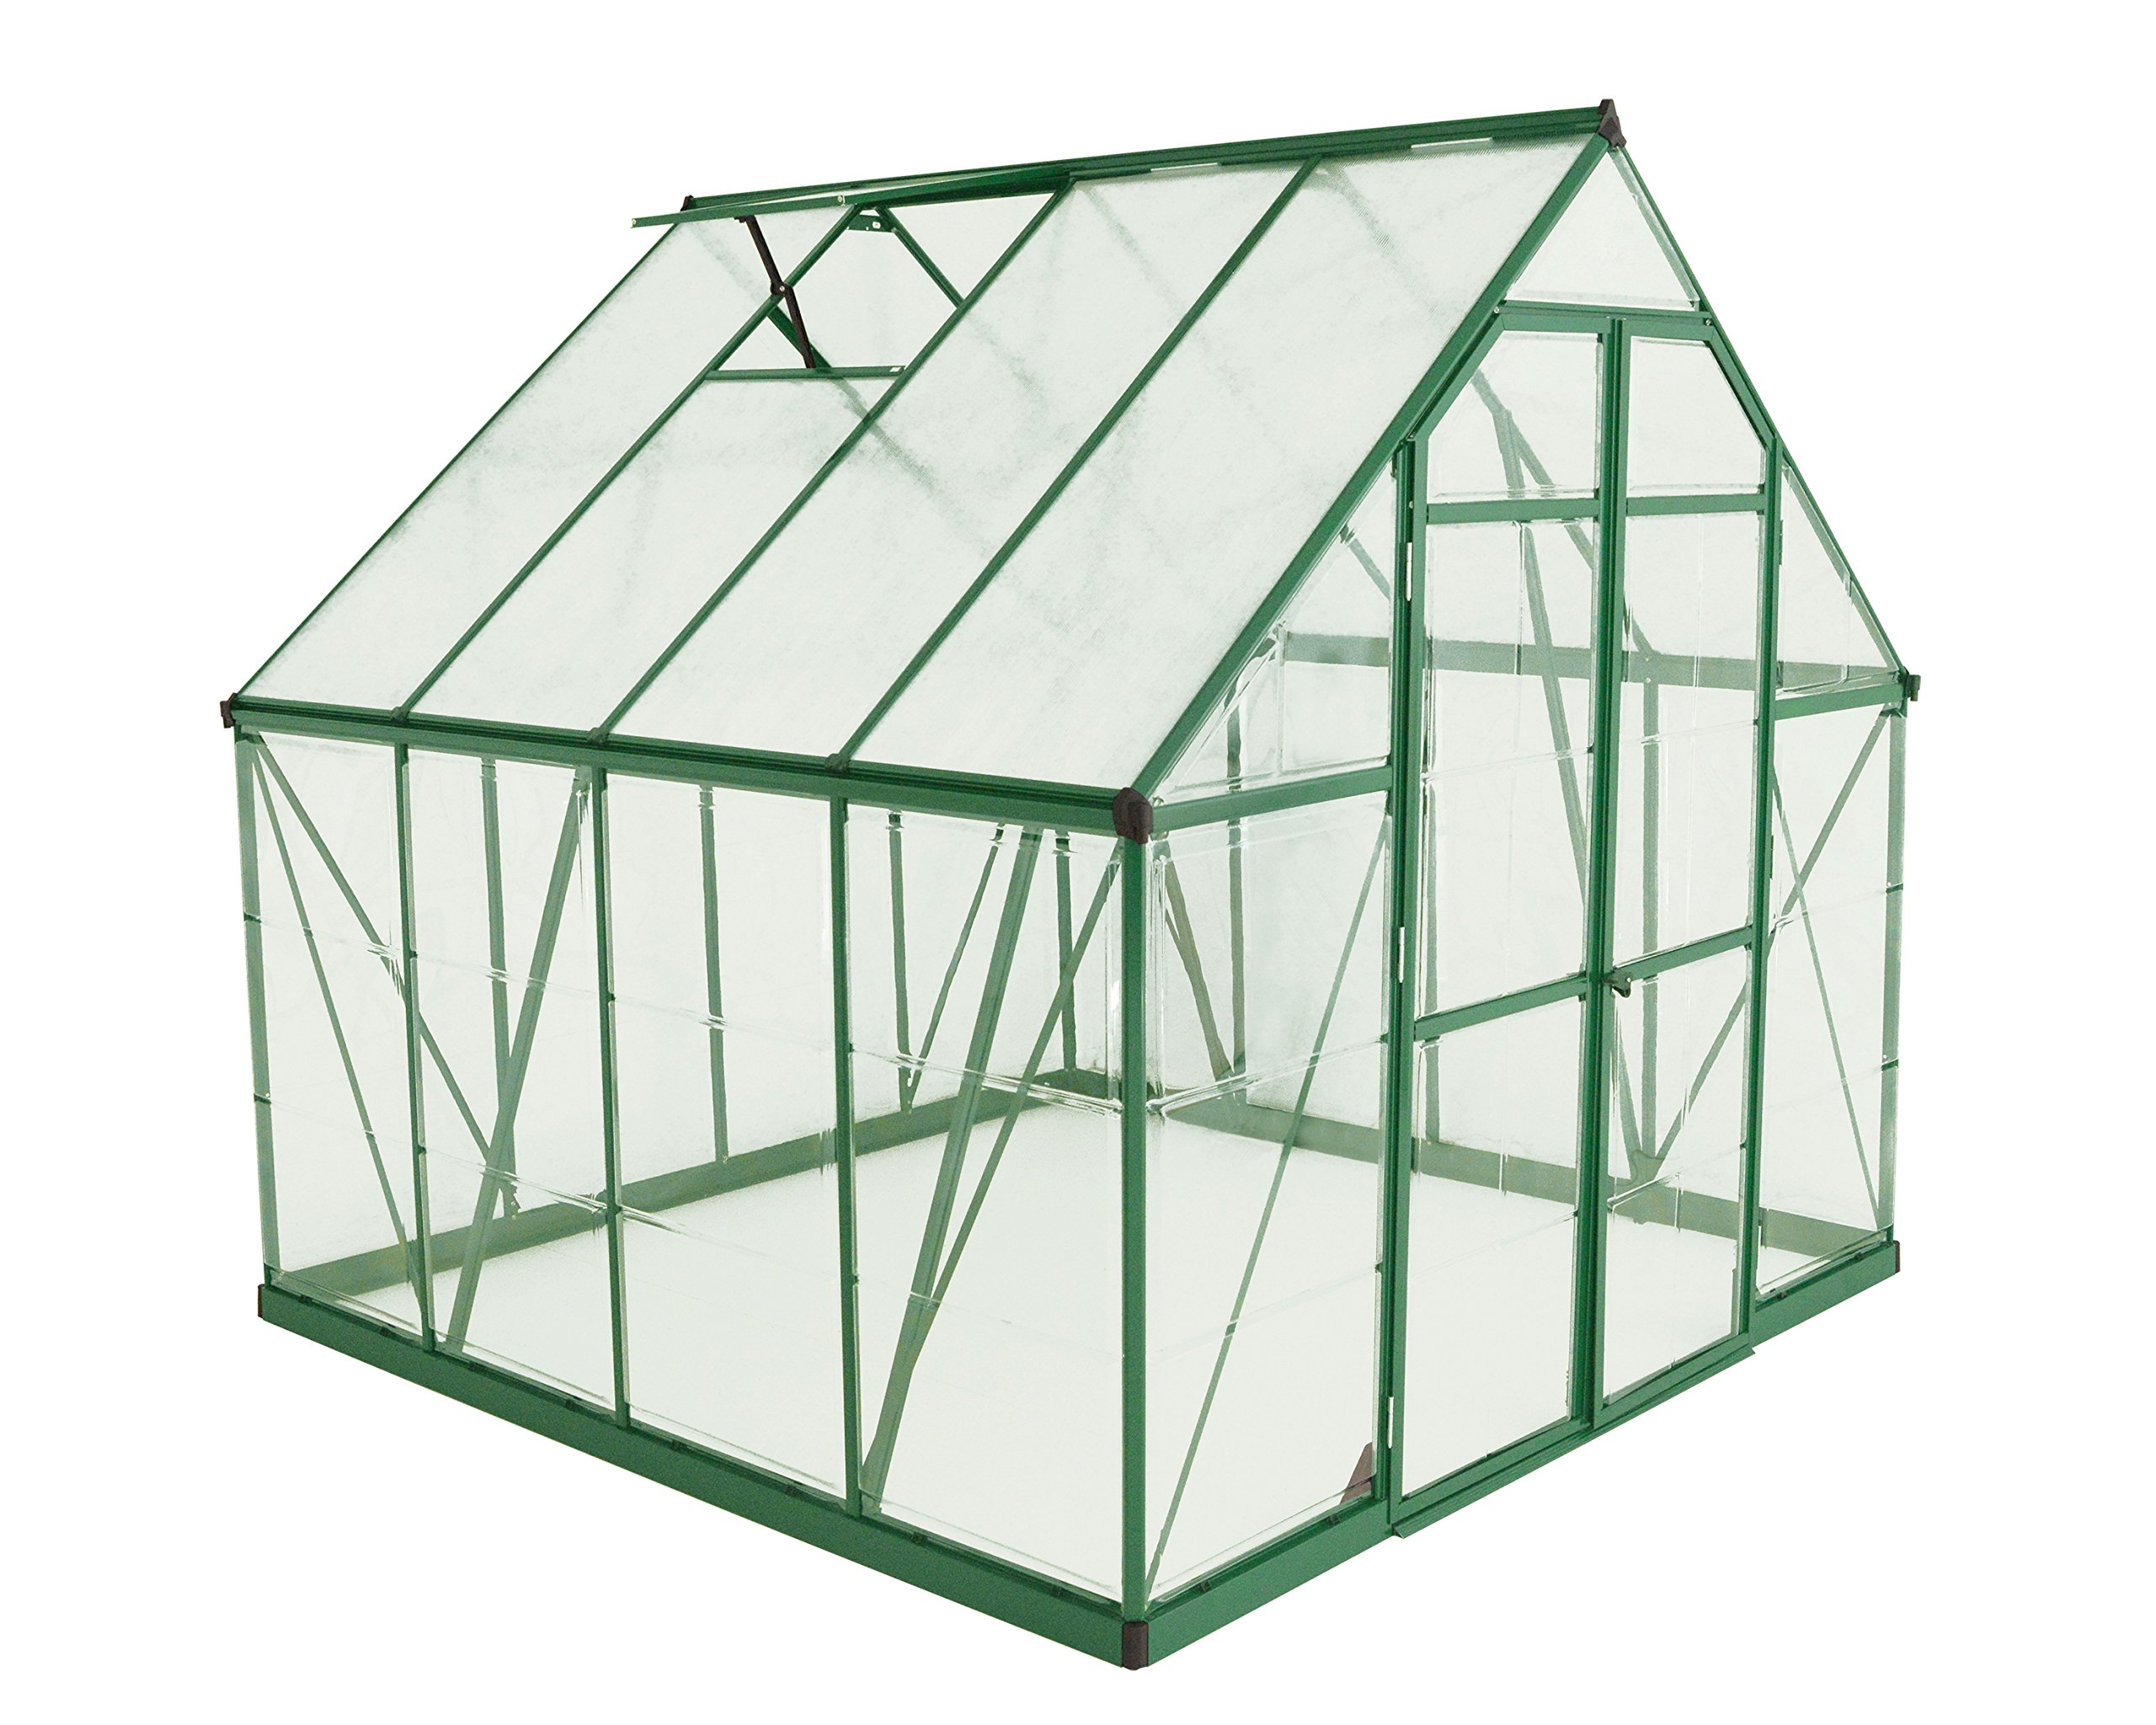 Palram Balance Hobby Greenhouse, 8' x 8', Green